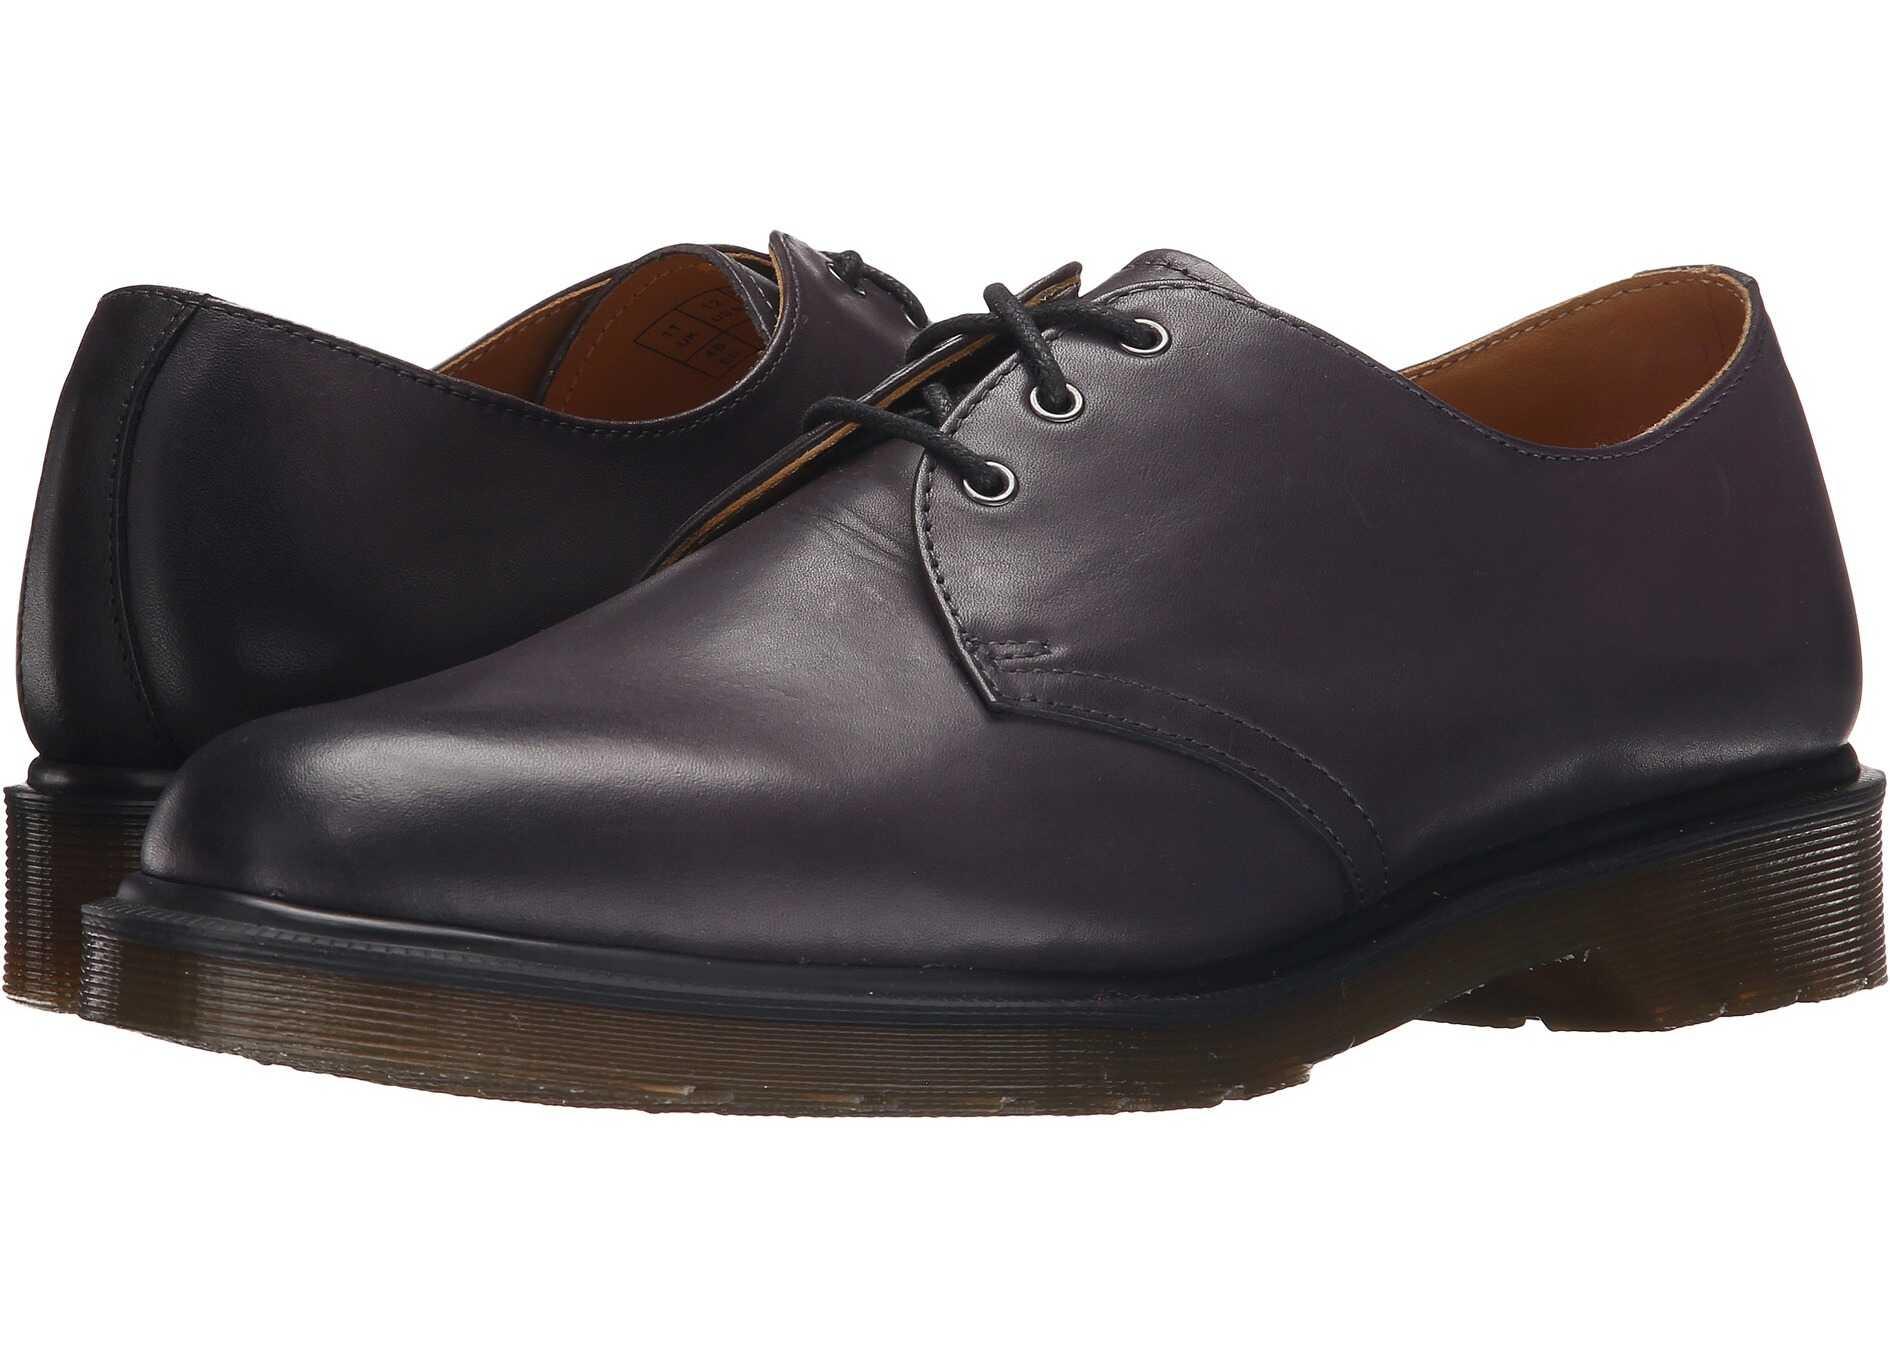 Dr. Martens 1461 3-Eye Shoe Charcoal Temperley